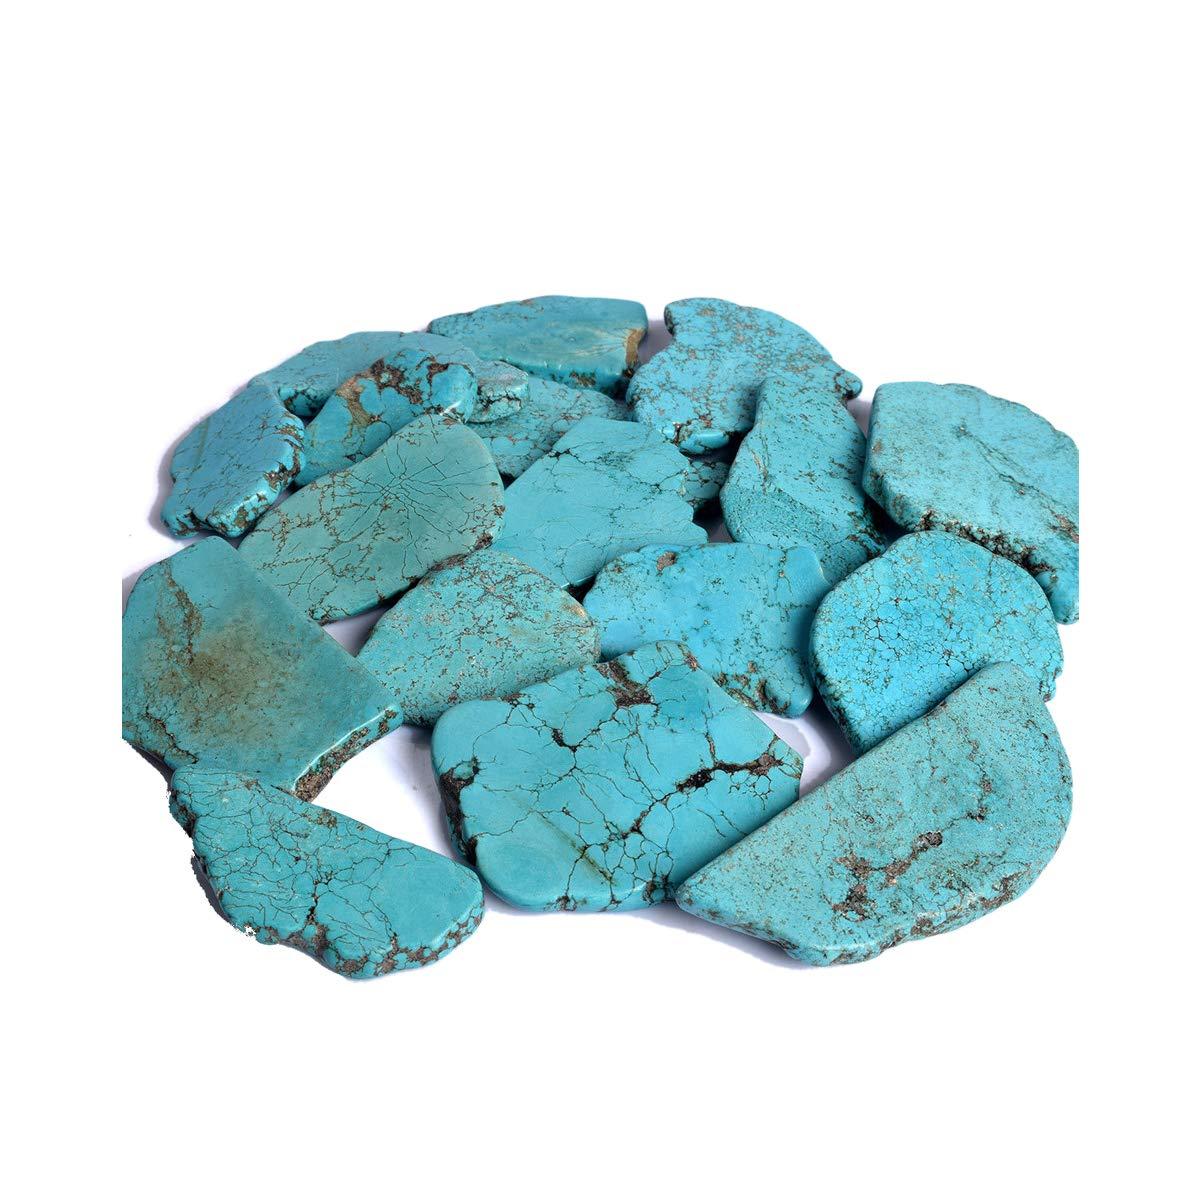 Natural Blue Turquoise Slab 300-400 Ct. Arizona Blue Turquoise Slab Raw Rough Loose Gemstone Per Piece hamlet e commerce AB-111